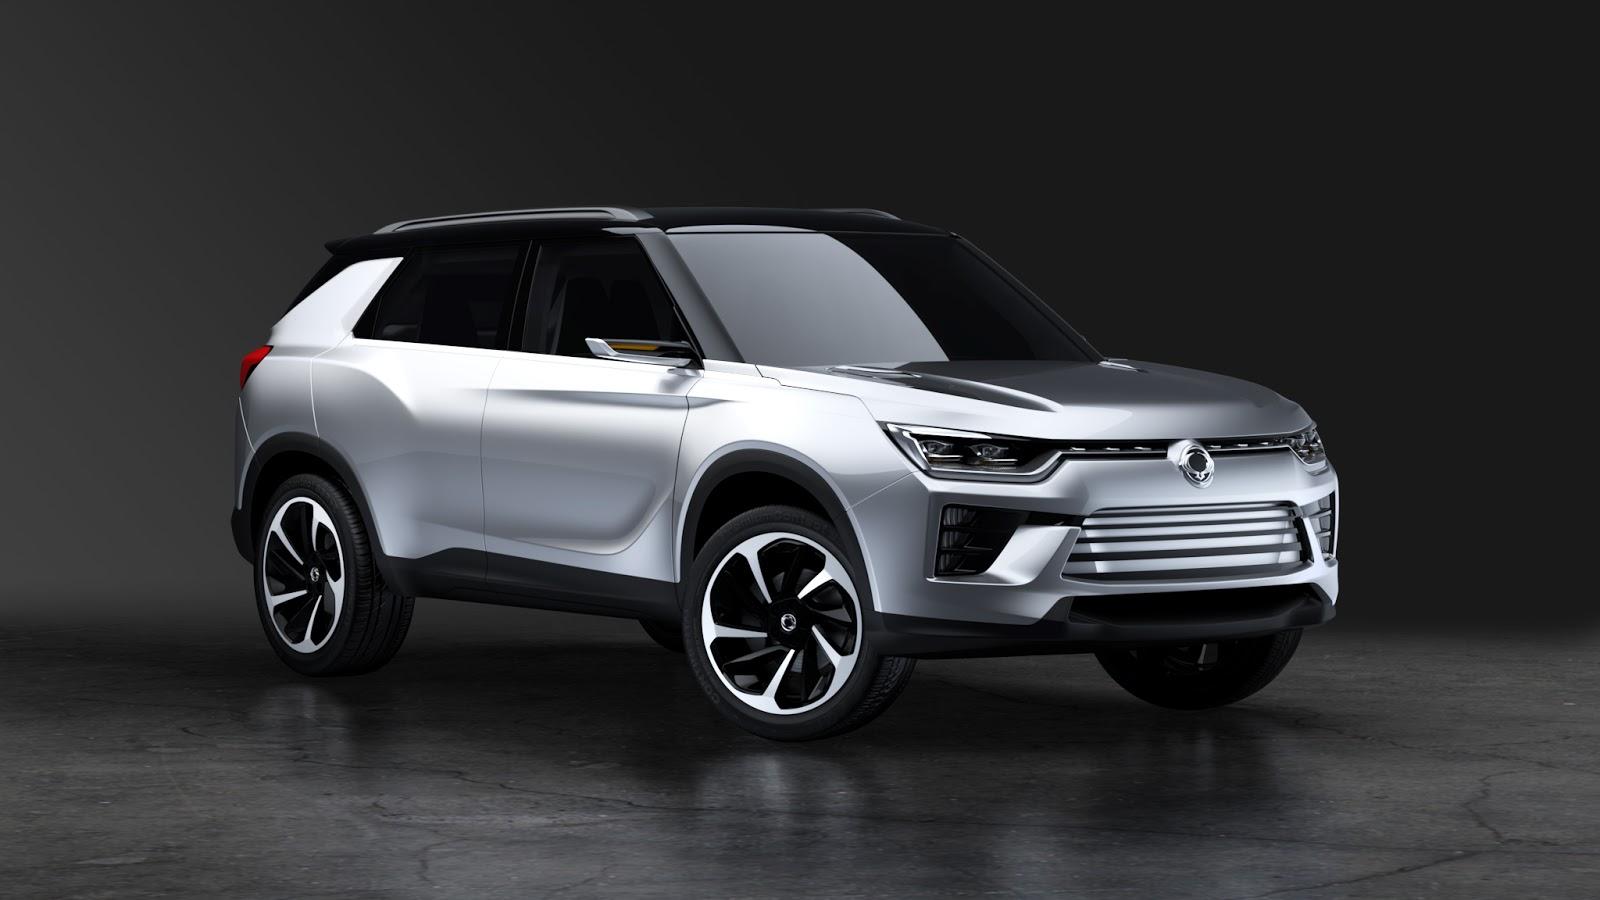 SIV 2%2Bfront Η SSANGYONG παρουσιάζει ένα μεσαίο πολυχρηστικό SUV